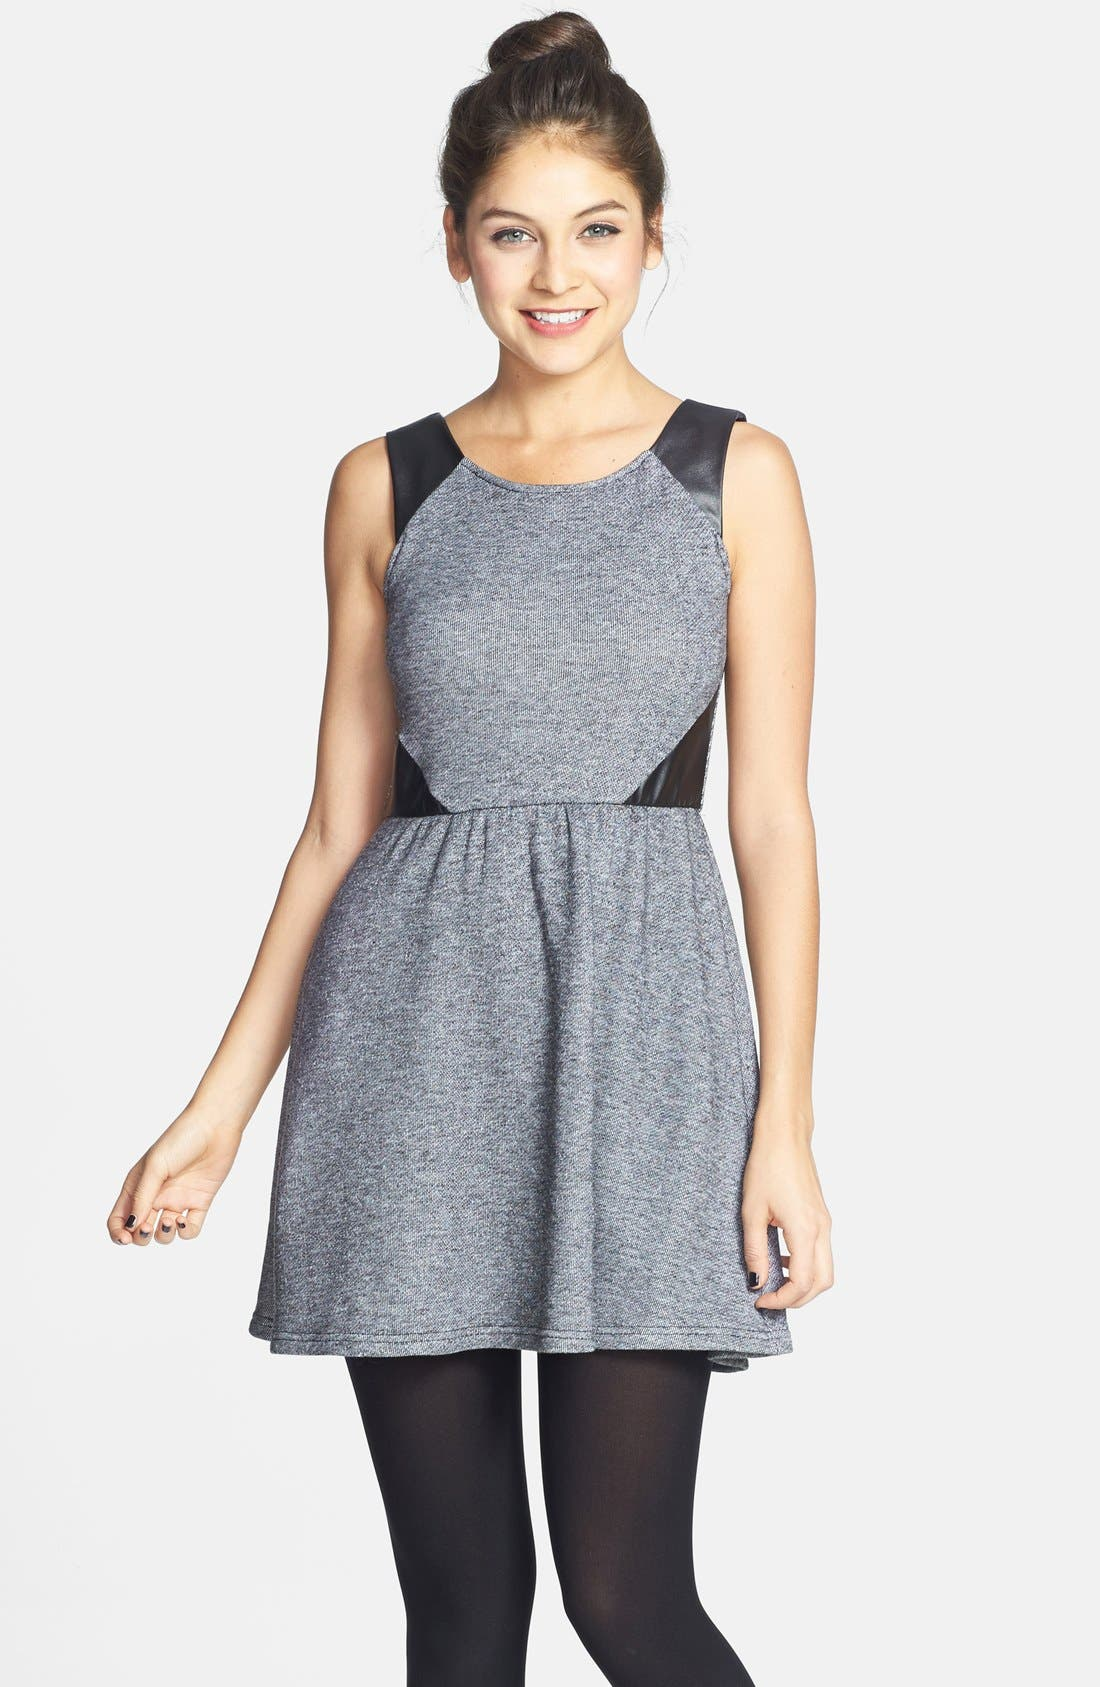 Alternate Image 1 Selected - Socialite Faux Leather Insert Skater Dress (Juniors) (Online Only)